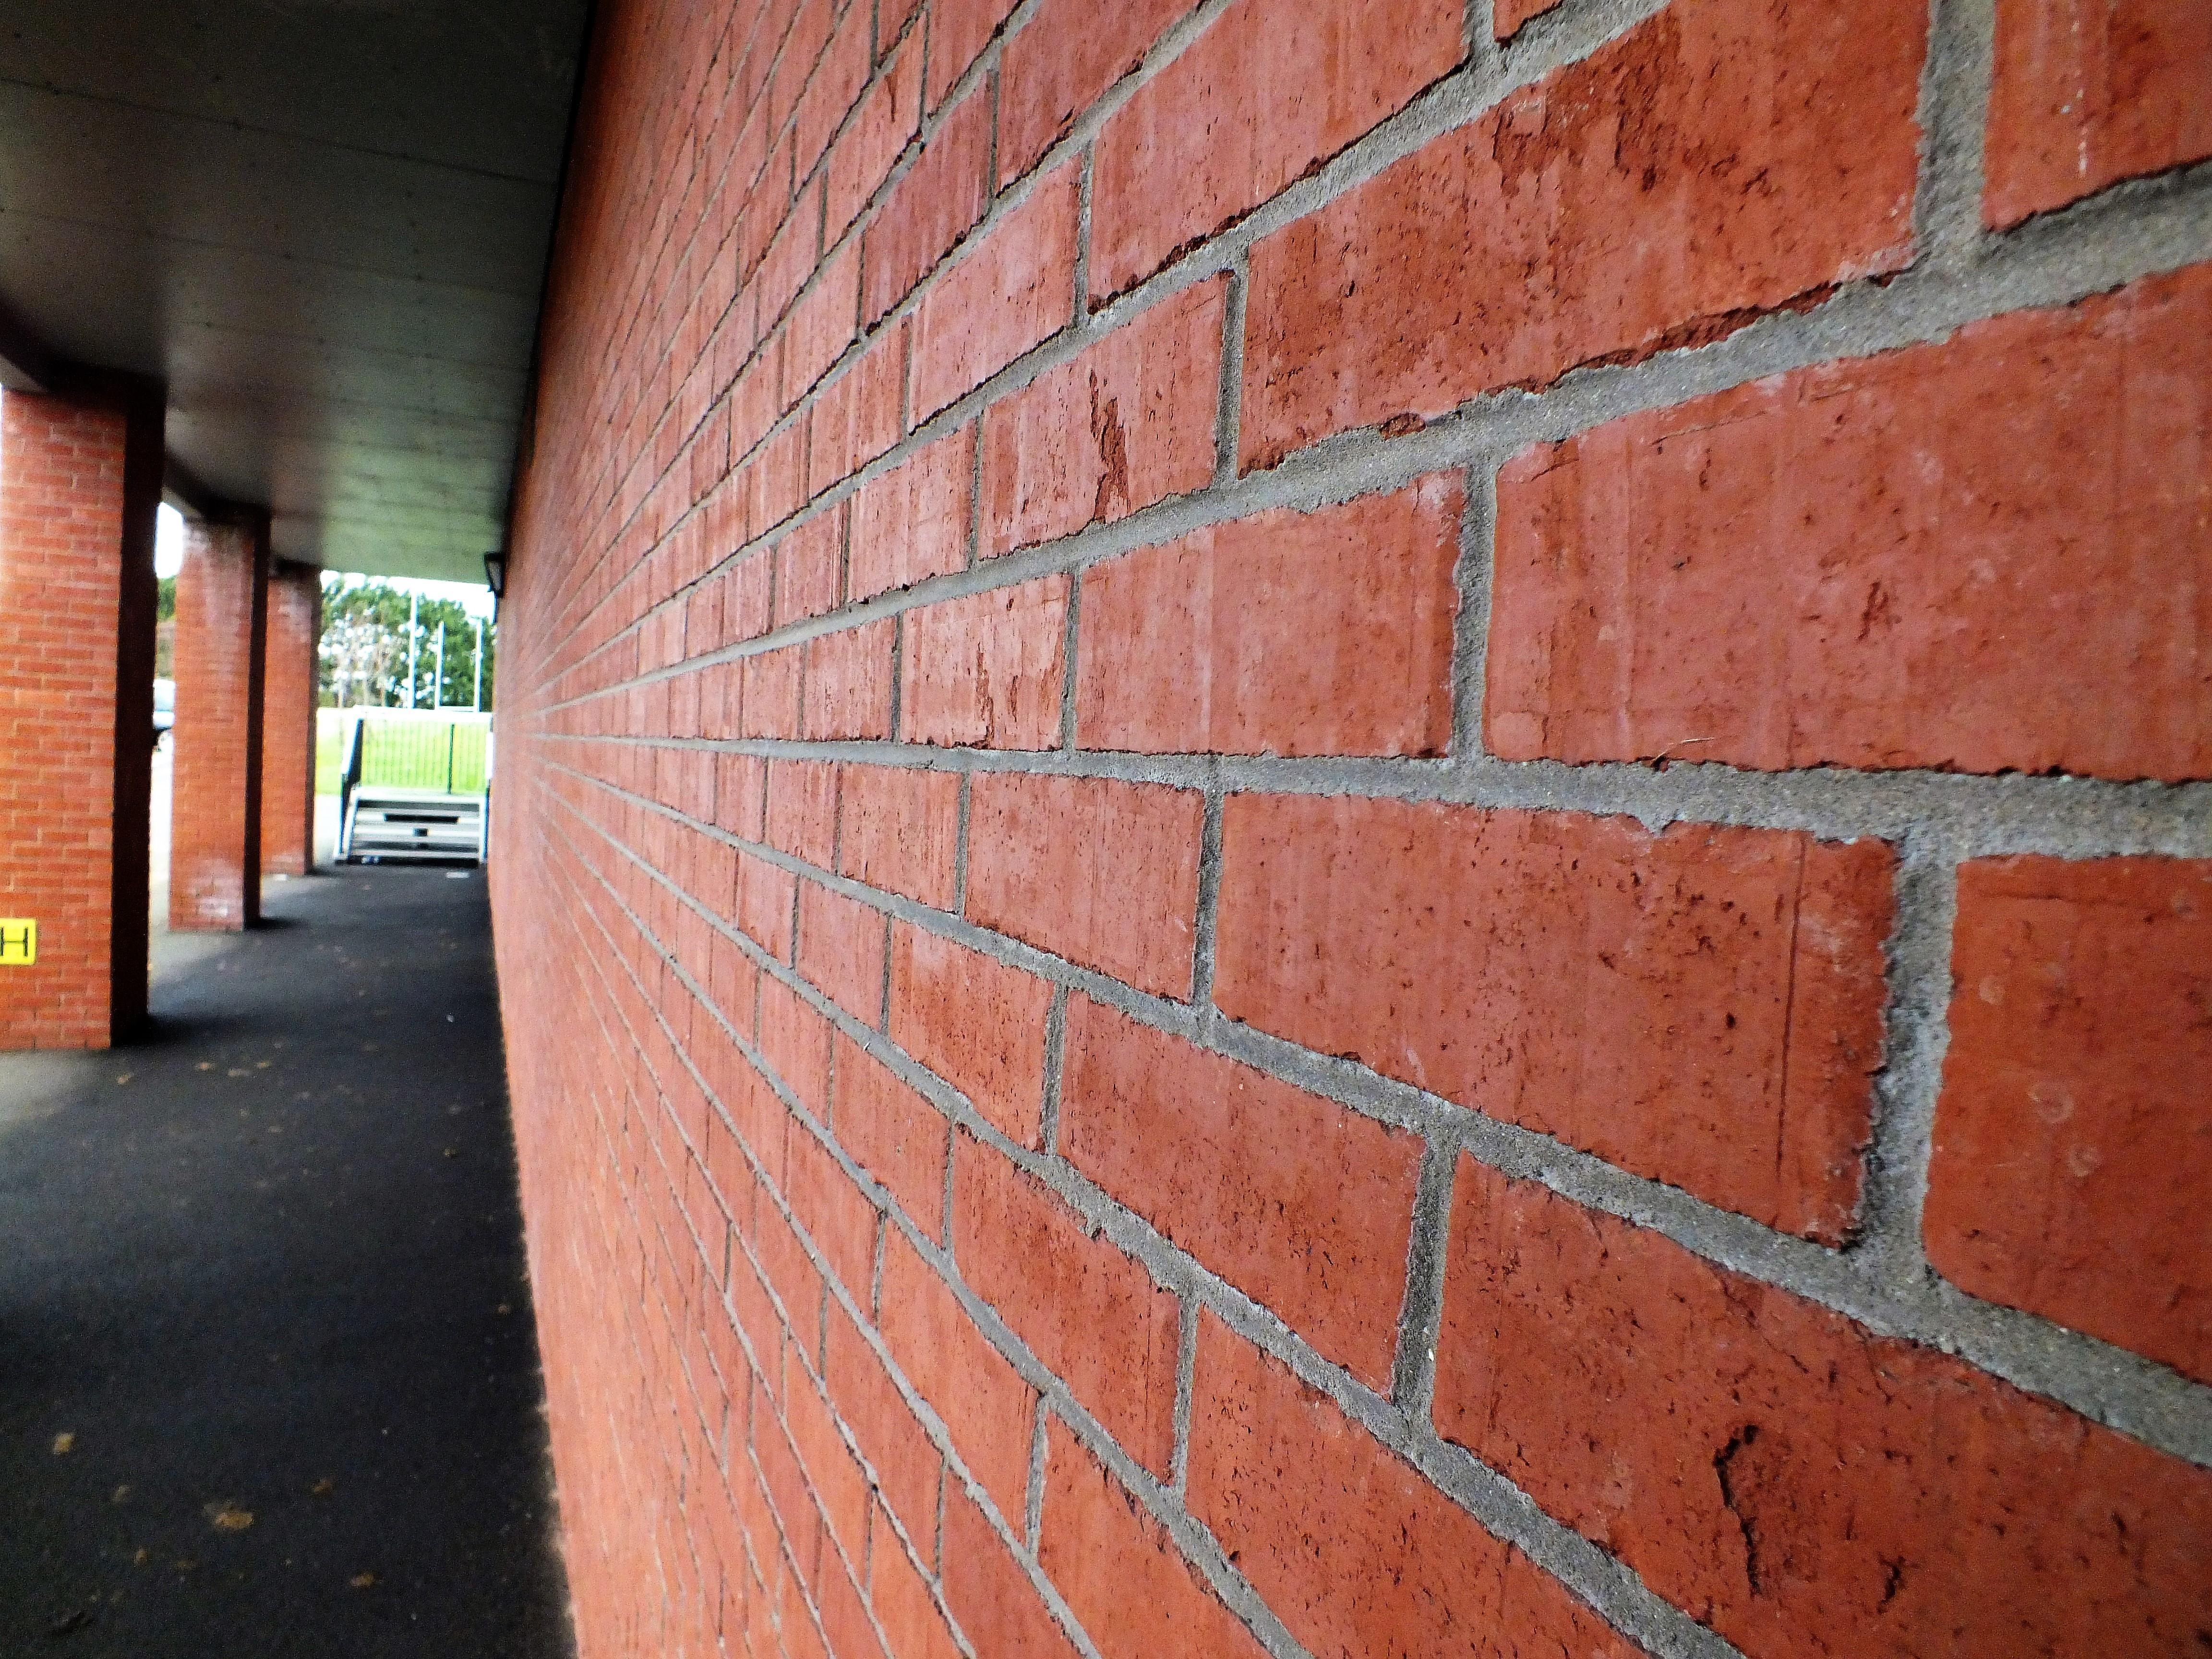 Detail of brickwork